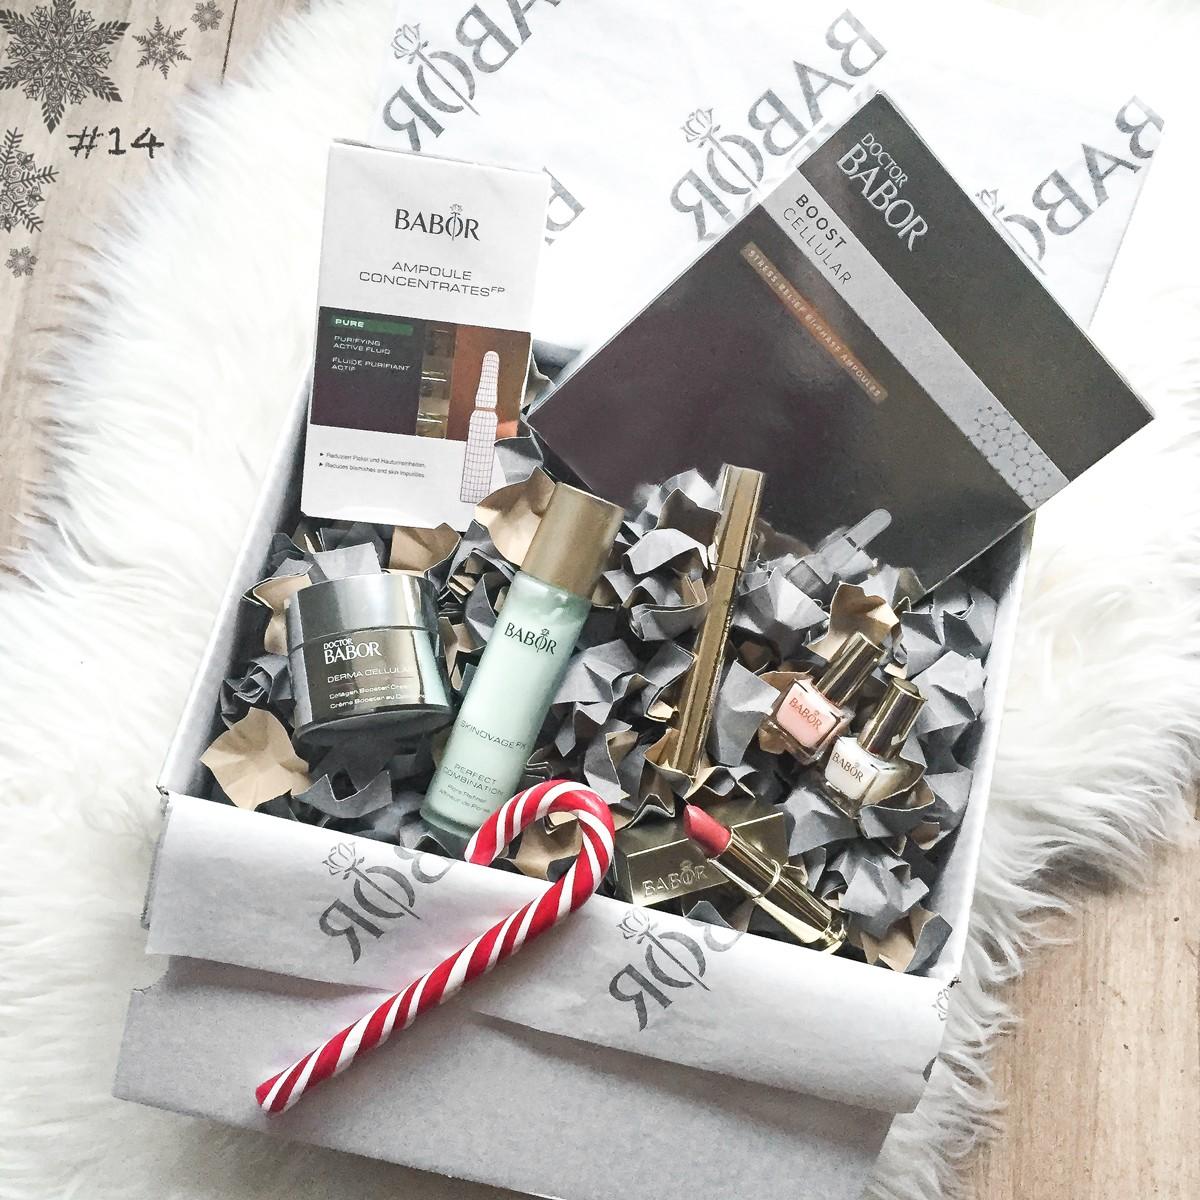 Blogger Adventskalender 2015 II How I met my outfit by Dana Lohmüller  II großes BABOR Beauty Paket im Wert von über 300 €